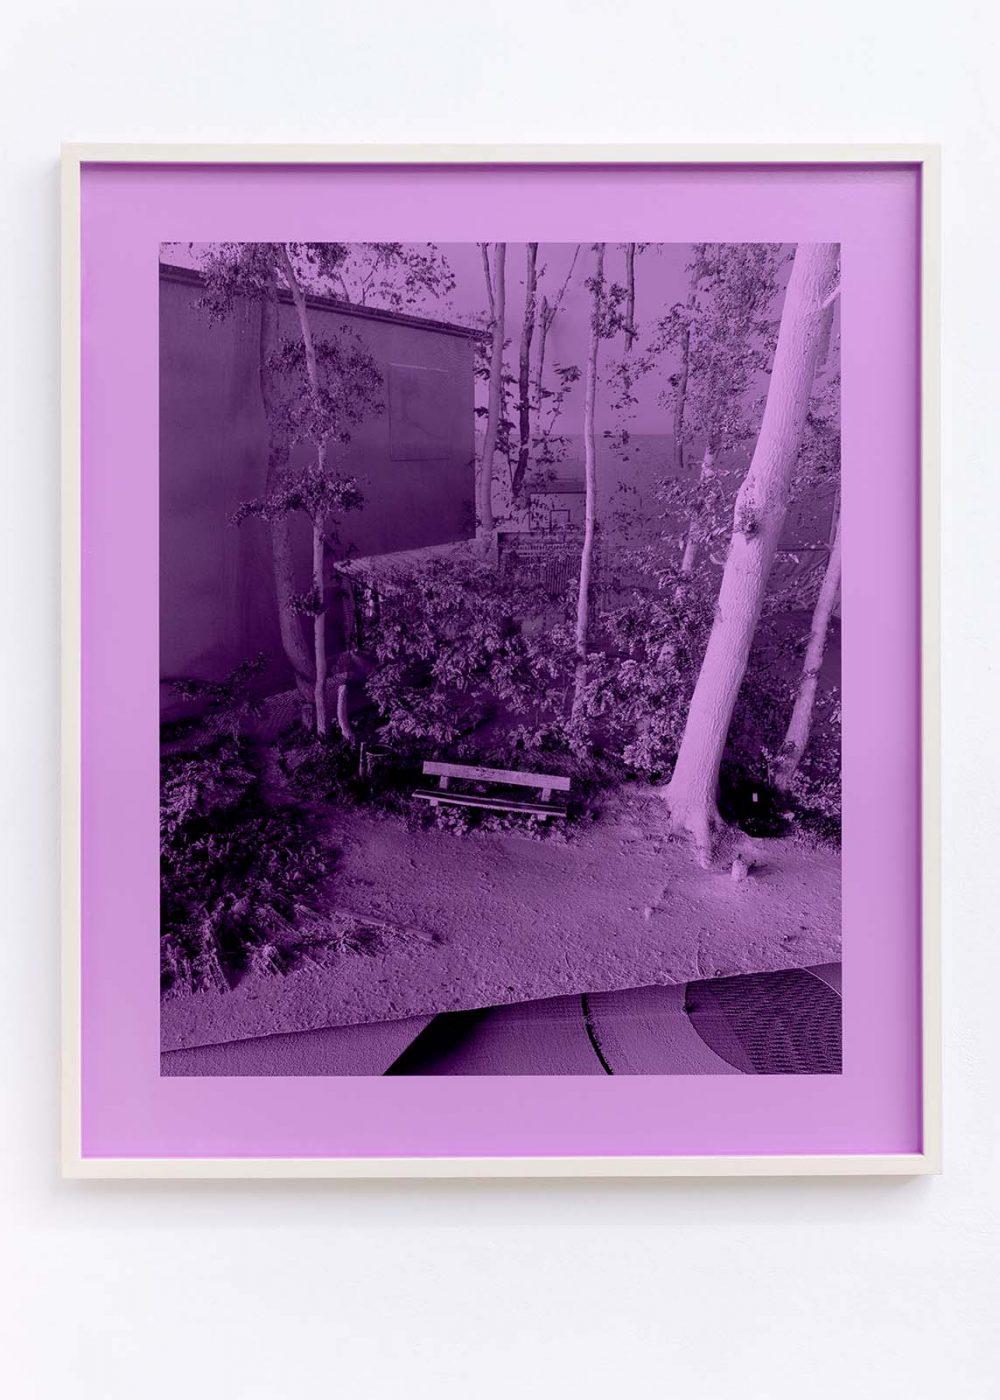 Tim Berresheim | Bank | Falko Alexander gallery